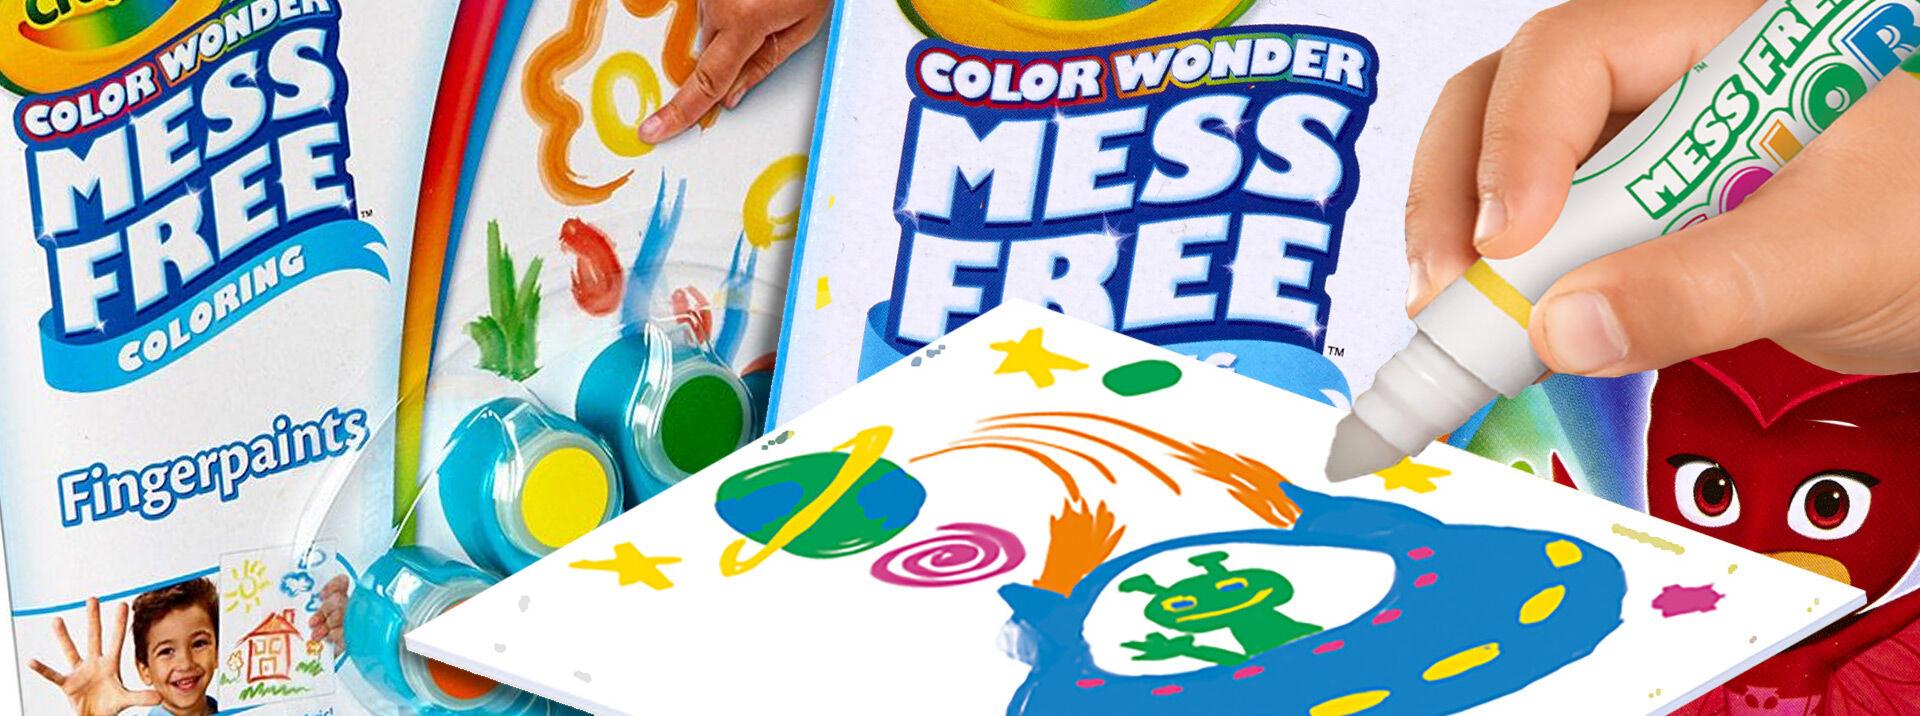 Mess-Free Coloring